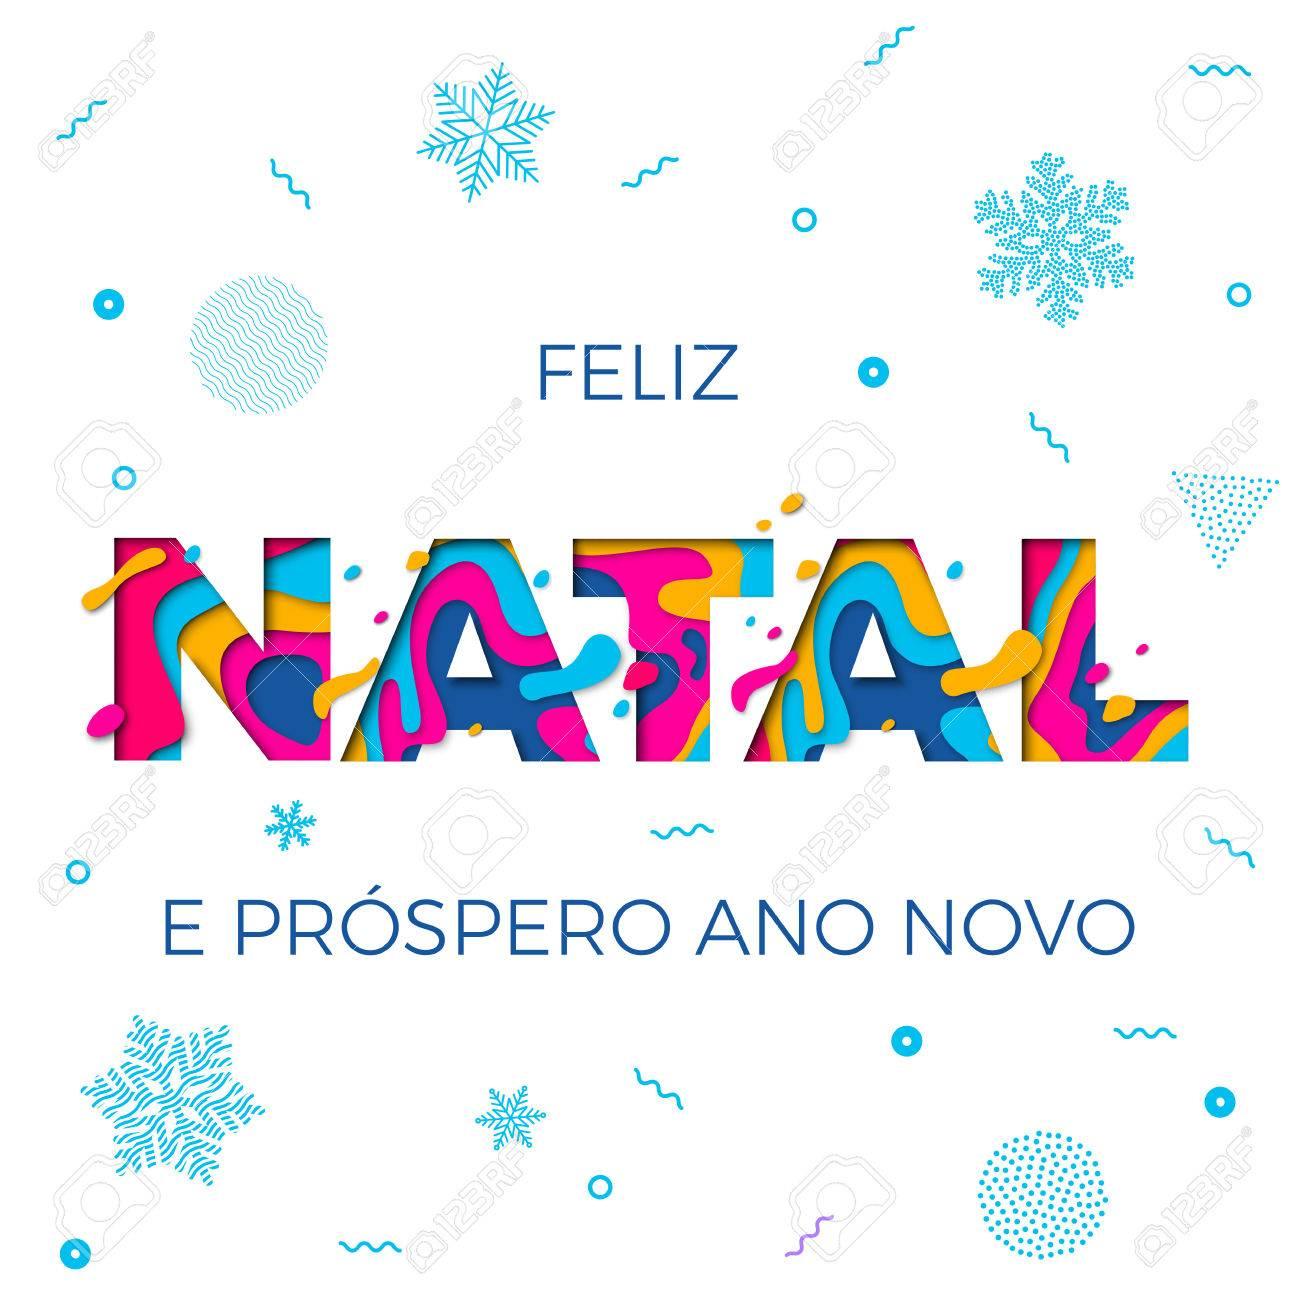 Feliz Natal Merry Christmas Portuguese Greeting Card, Ano Novo ...